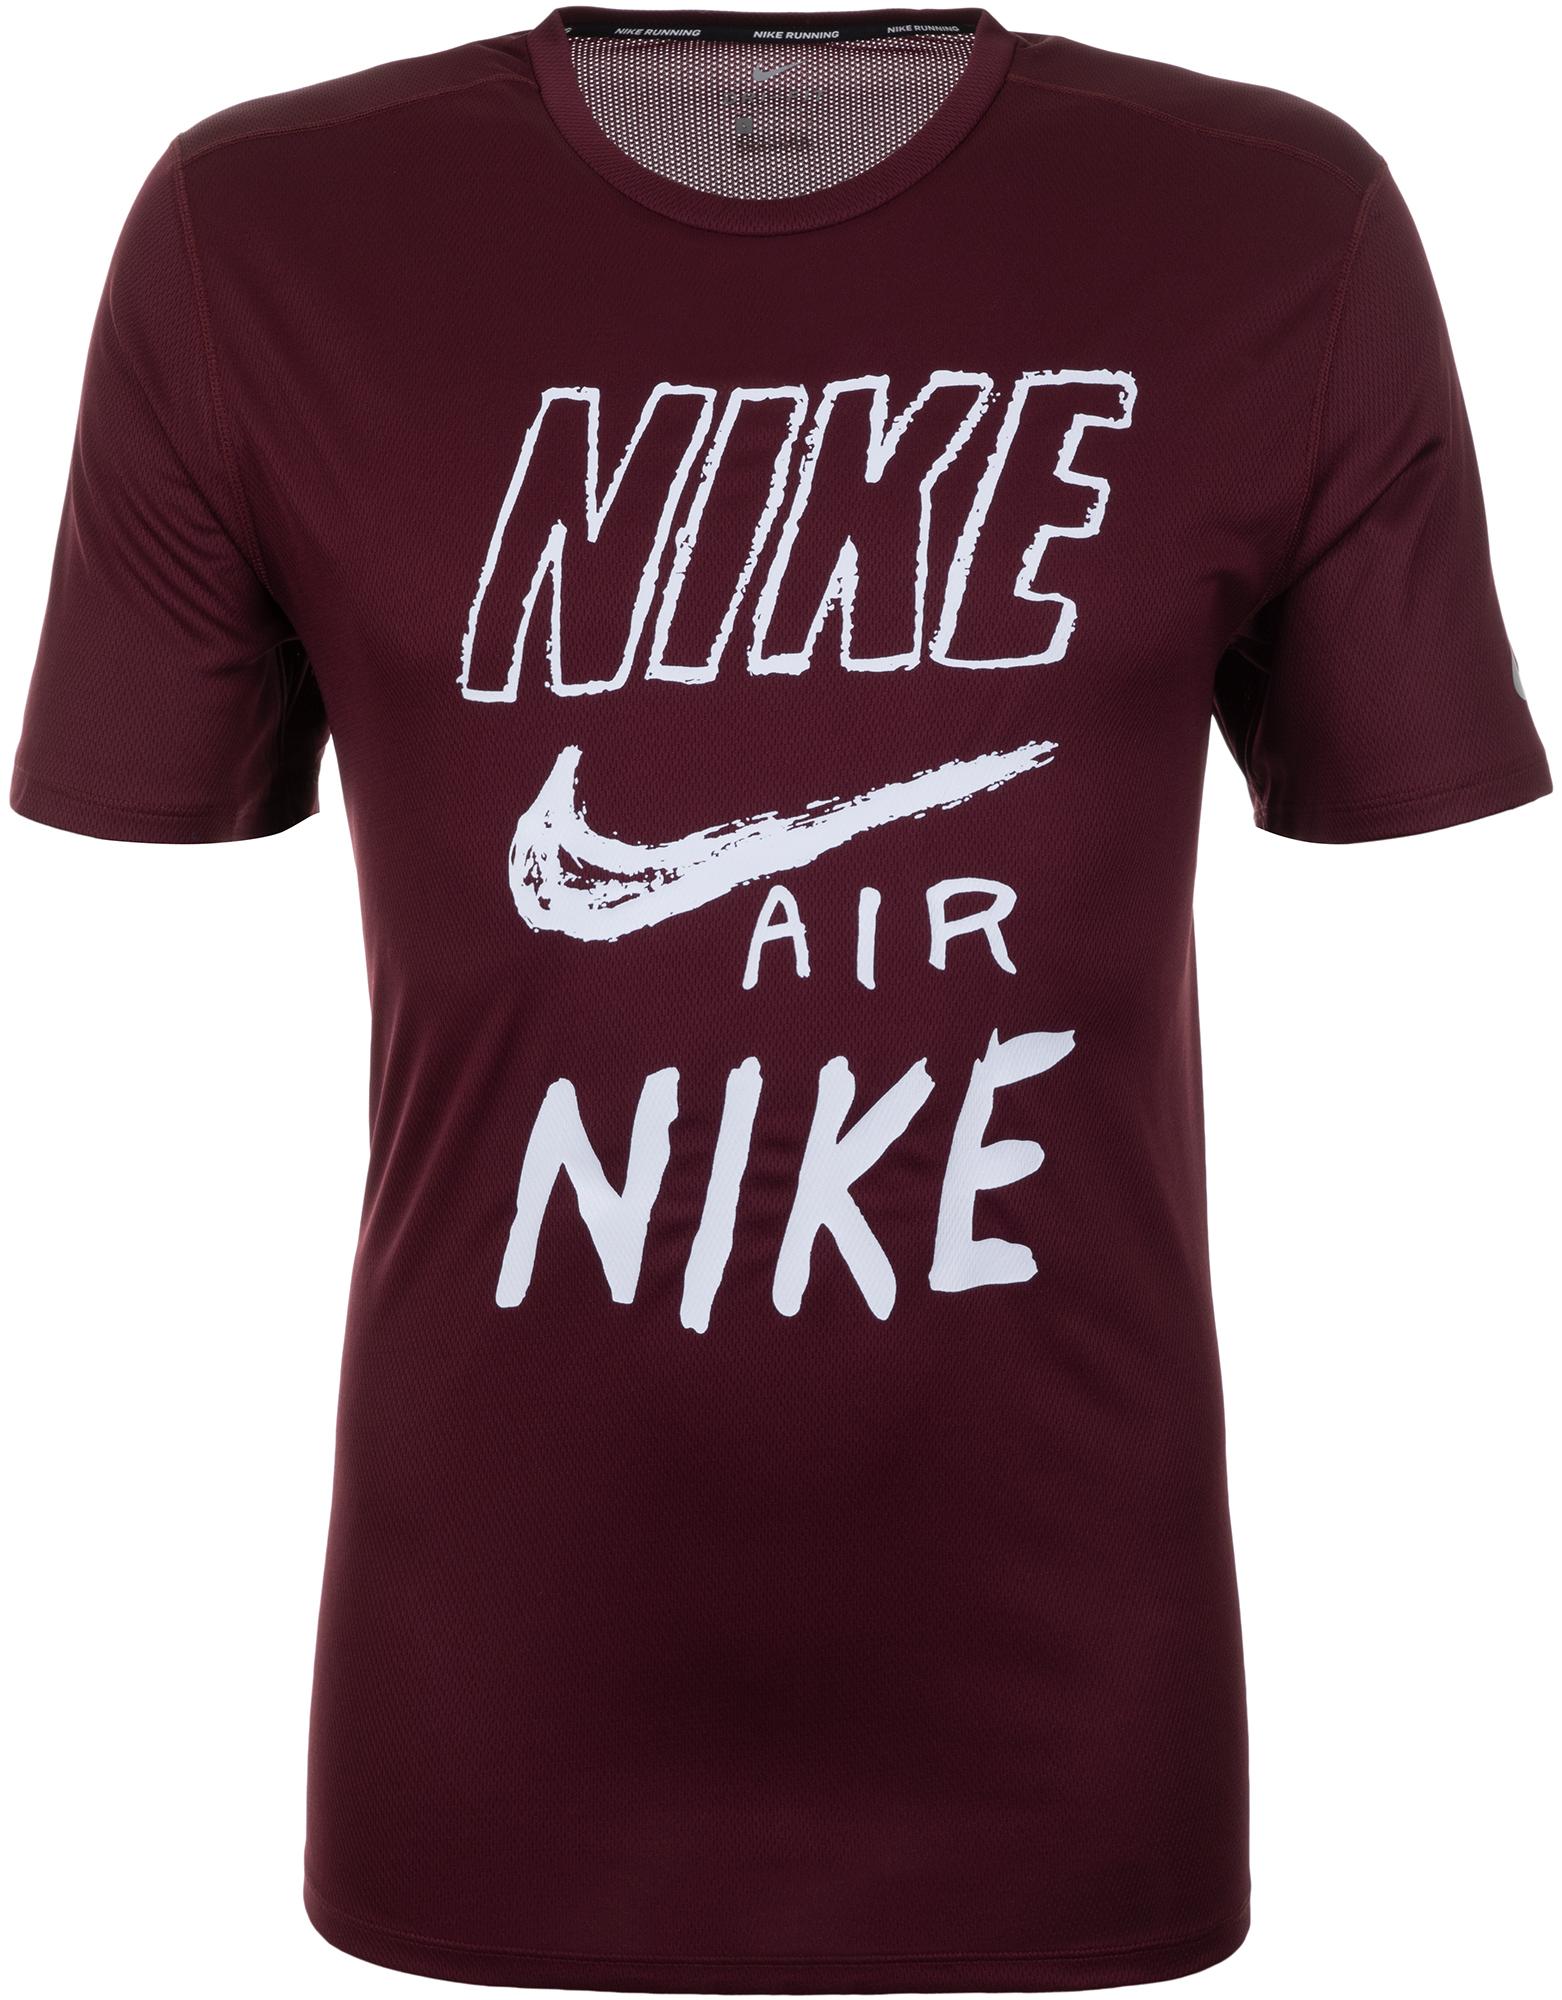 Nike Футболка мужская Nike Breathe, размер 44-46